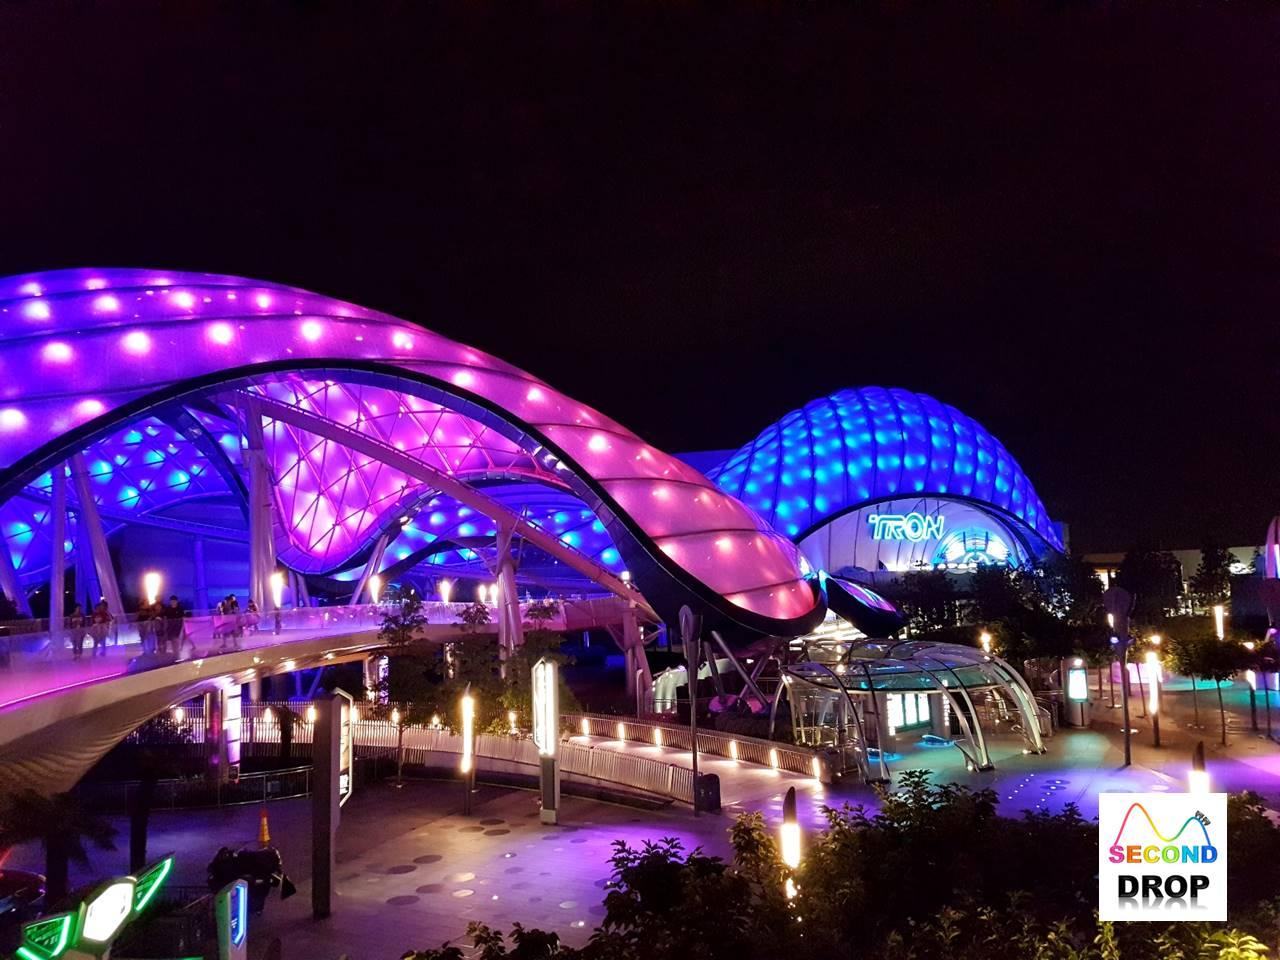 https://4.bp.blogspot.com/-PrzhnTWe_2E/WWR7QQCxocI/AAAAAAAAD84/EUURxtzAdFkKsEMyZJ9eOHldxhQwlrnNwCLcBGAs/s1600/Shanghai-Disneyland-01.jpg